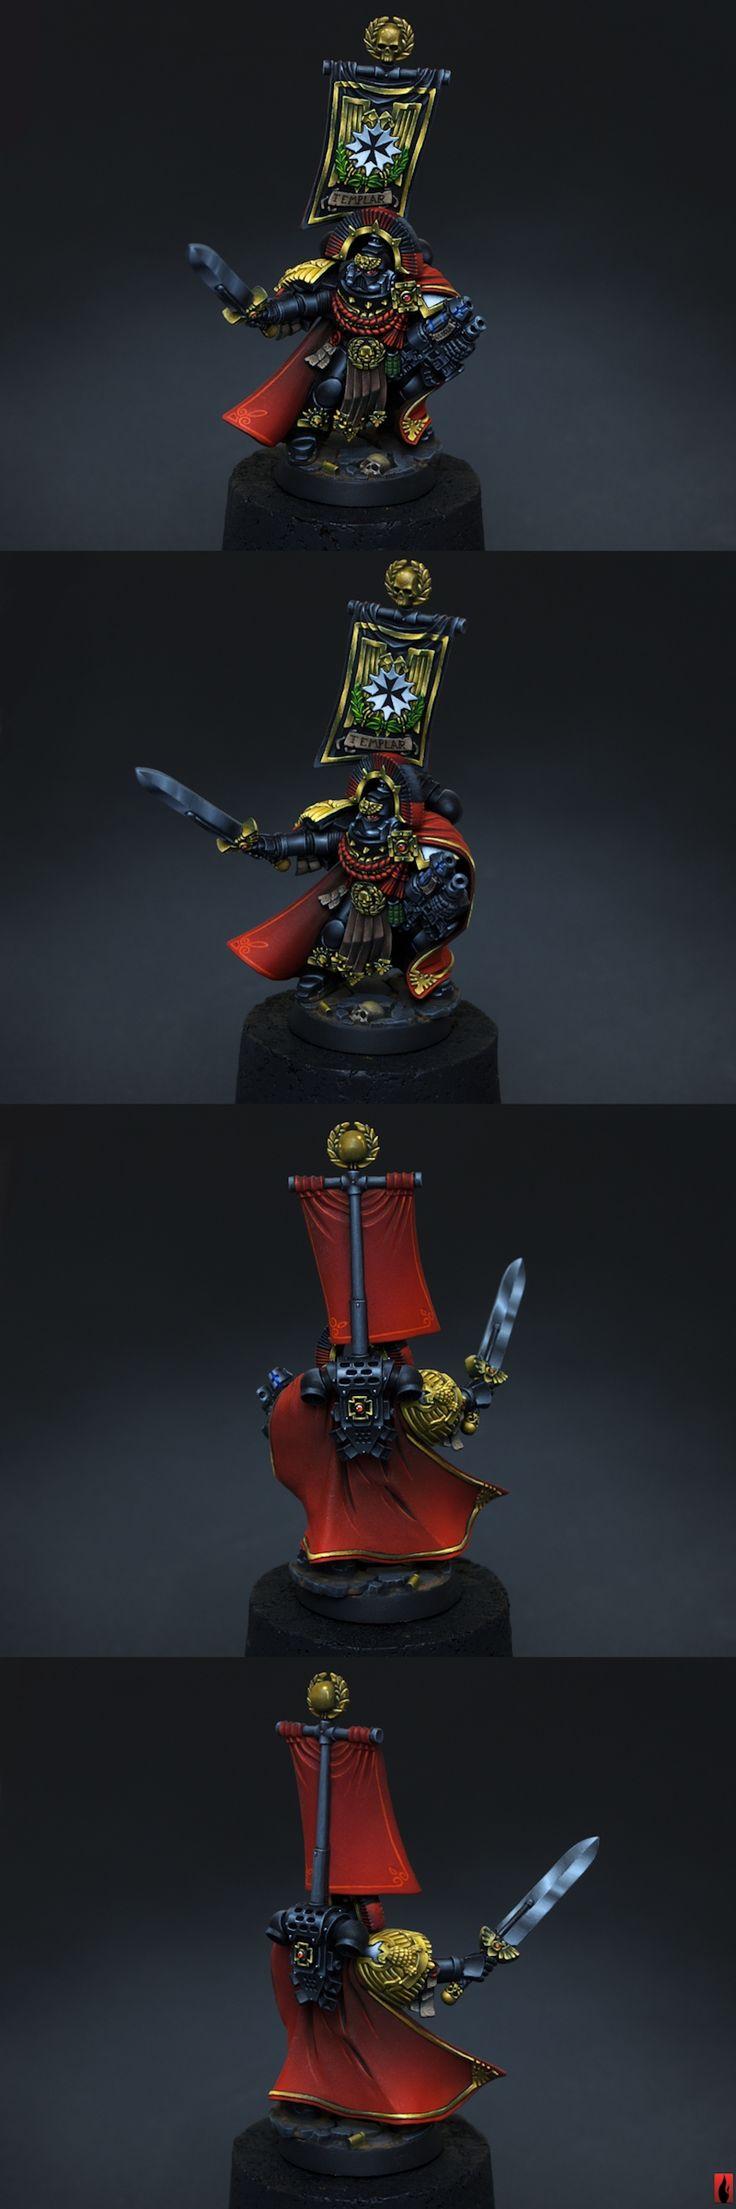 40k - Black Templars Space Marines Capitan by Flameon